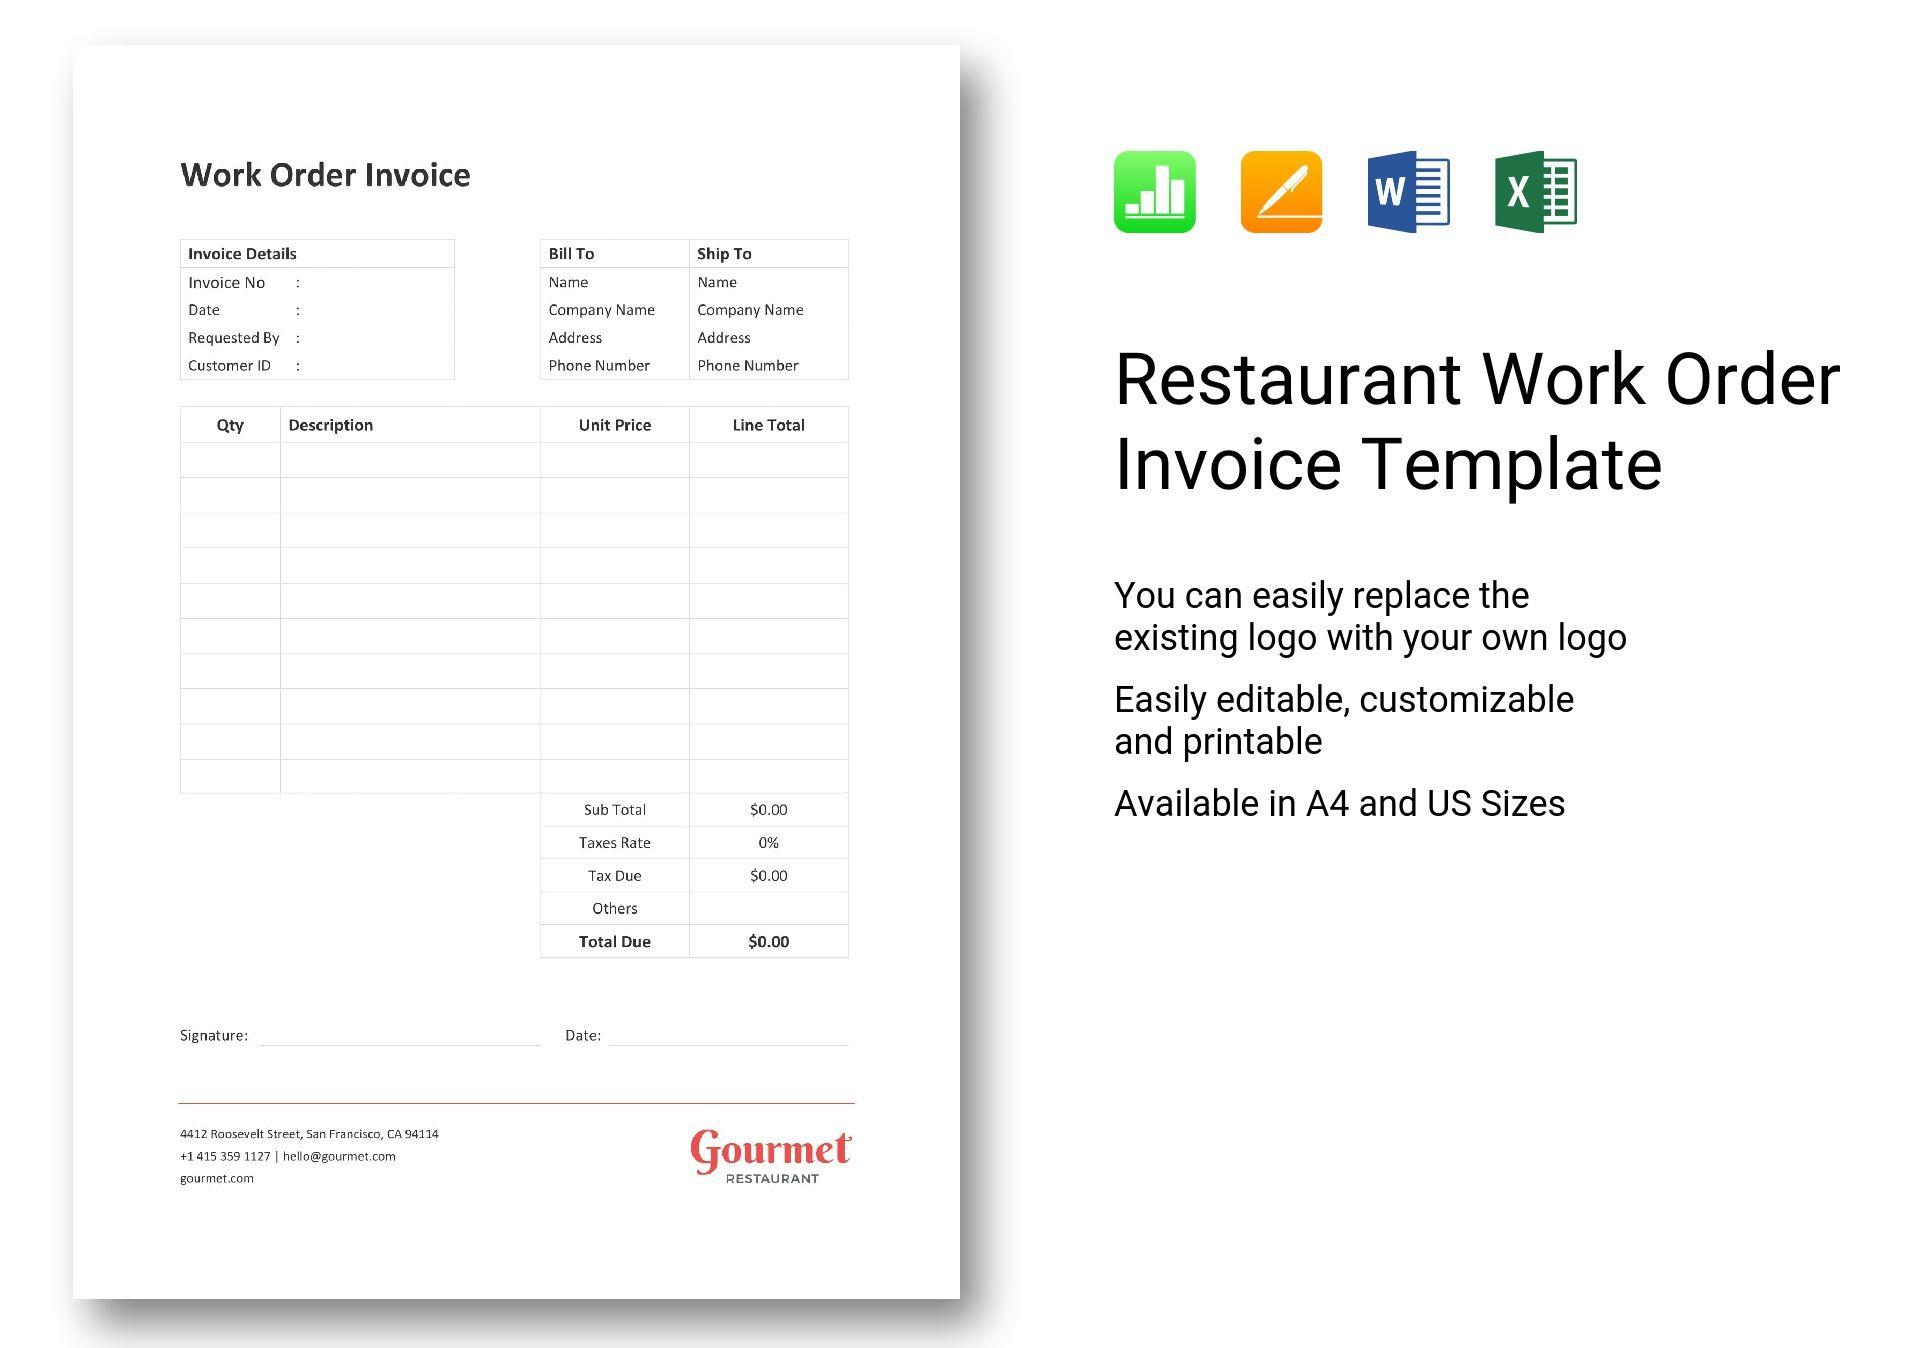 Restaurant Work Order Invoice